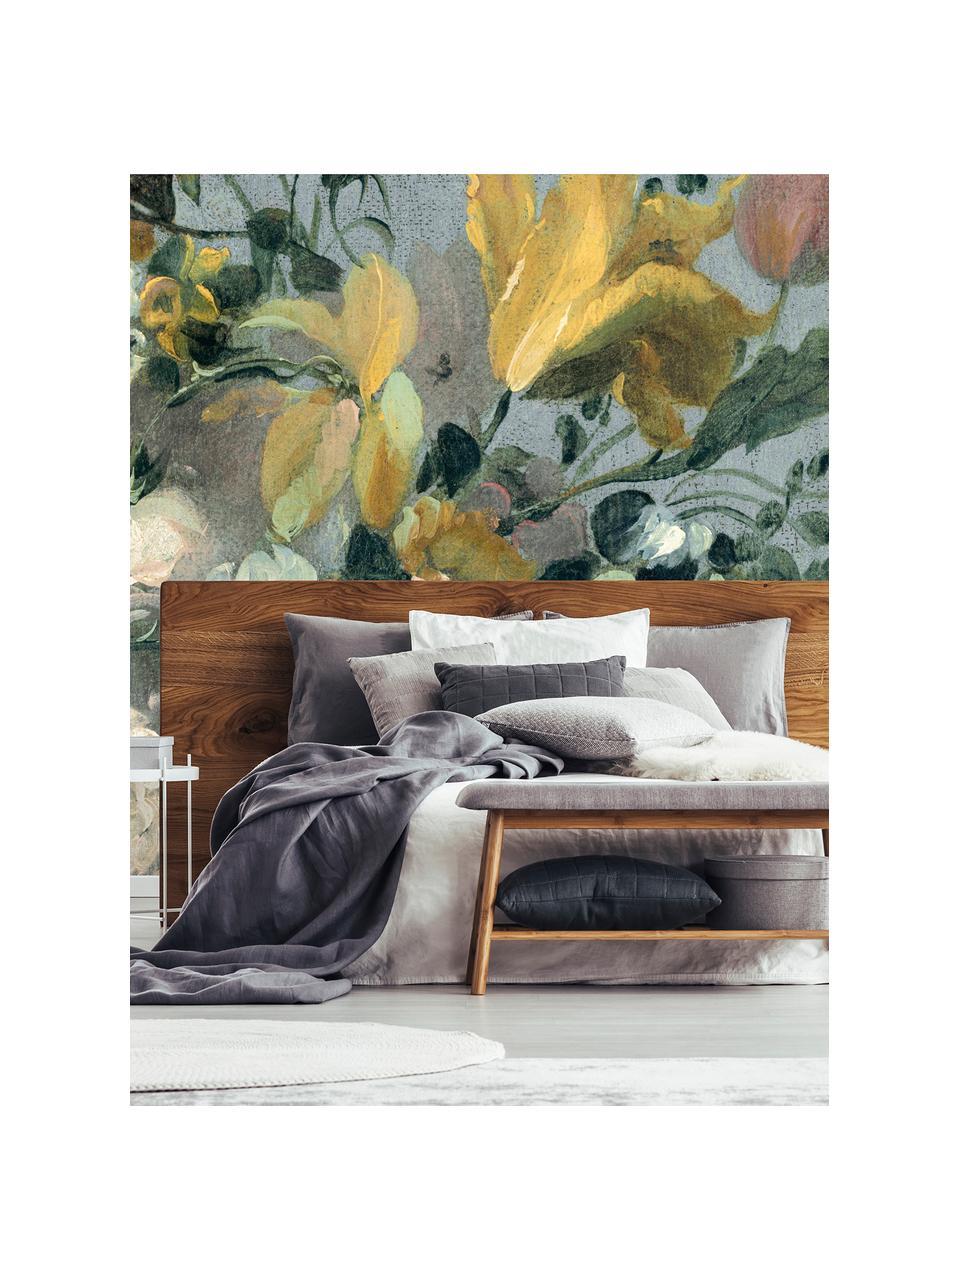 Adesivo murale Oil Painted Flowers Bright, Tessuto non tessuto, Multicolore, Larg. 372 x Alt. 280 cm